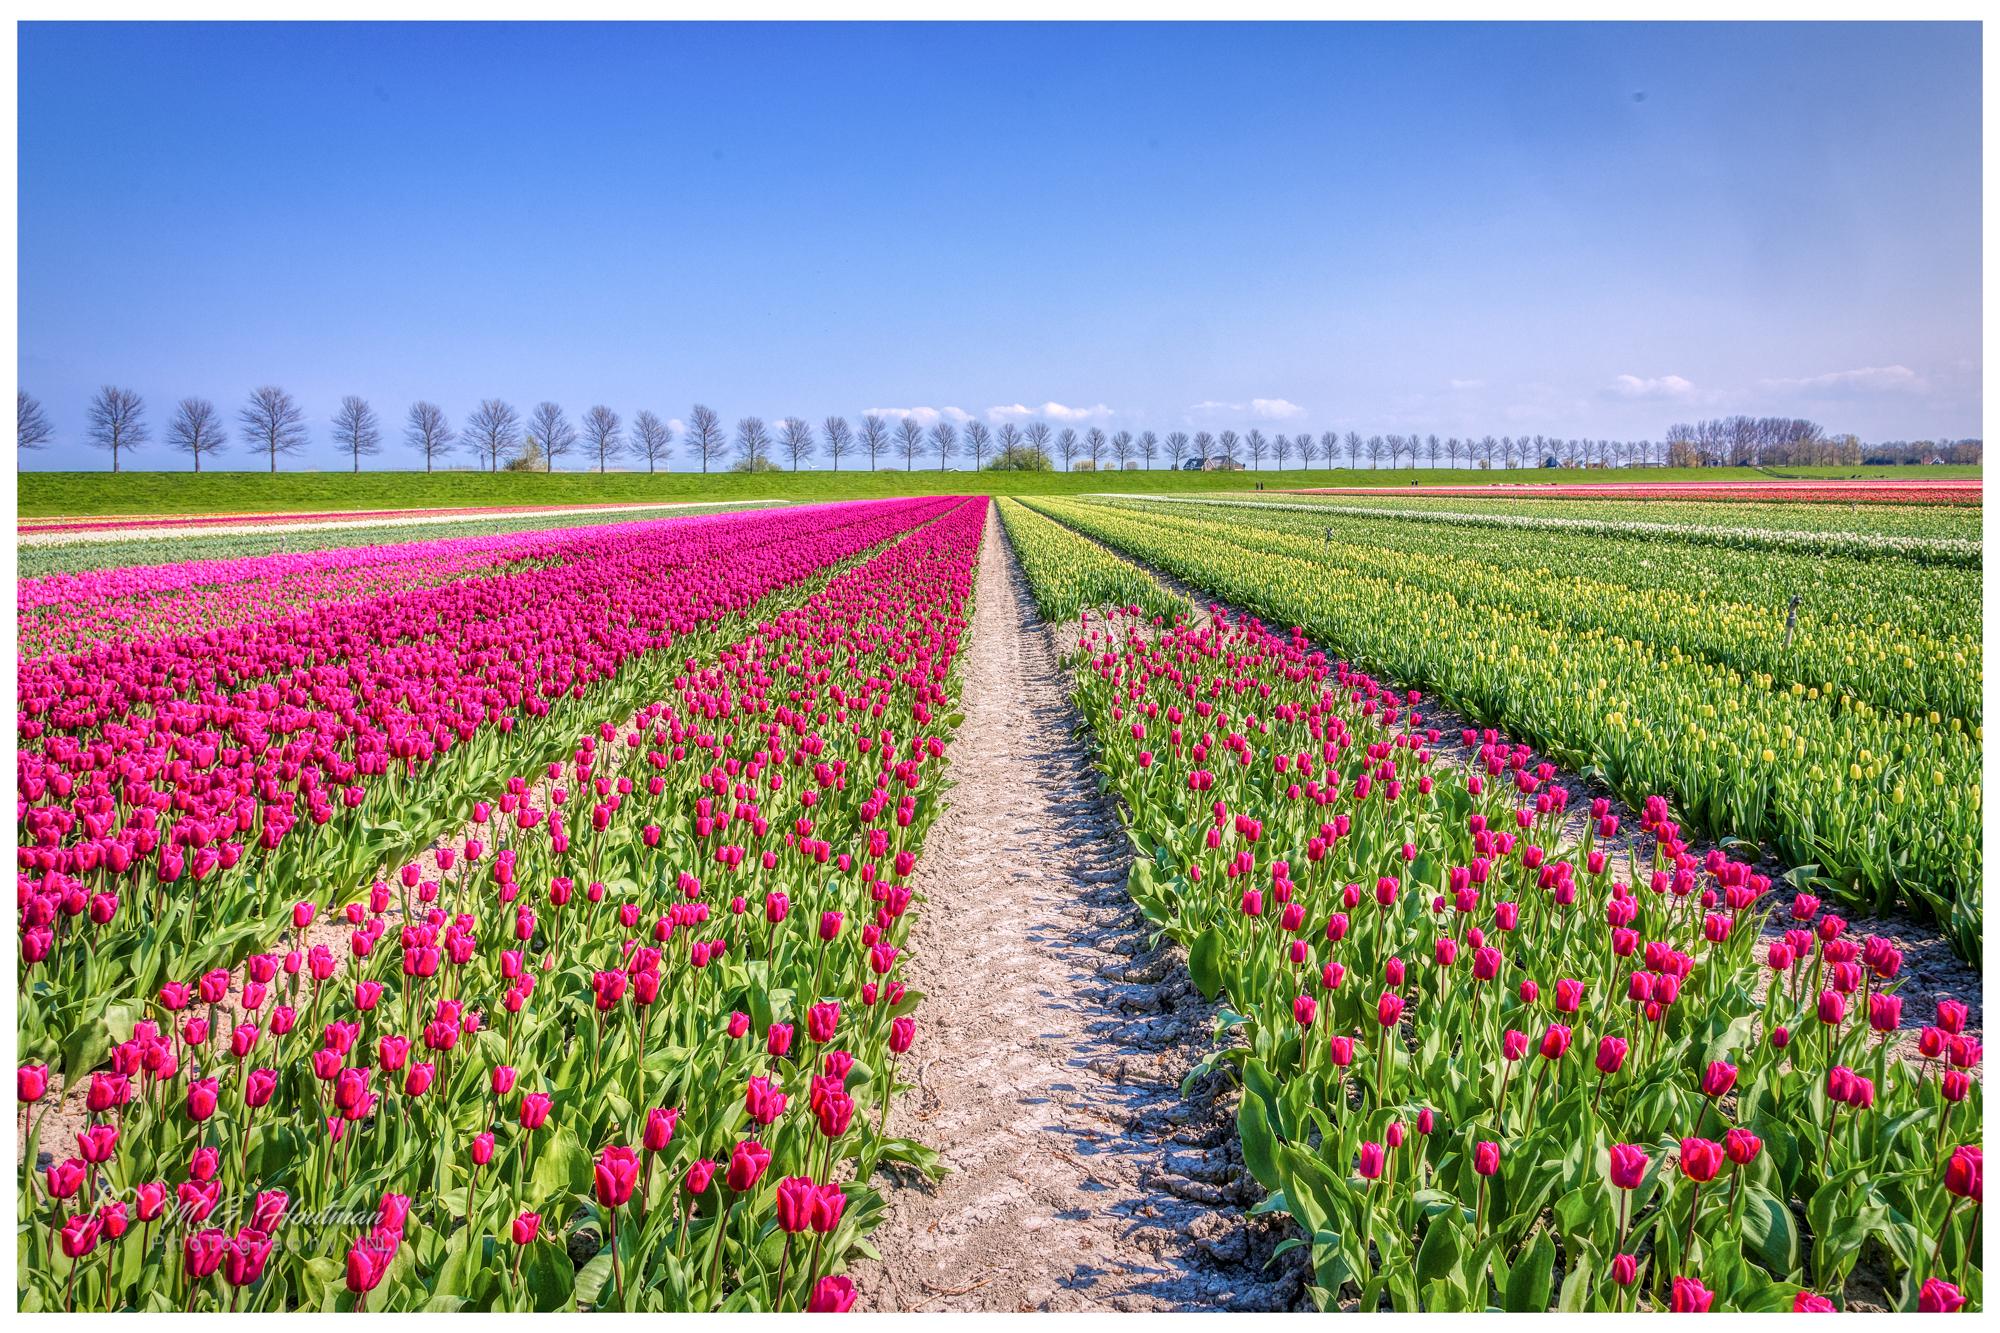 Fields of Dutch Tulips